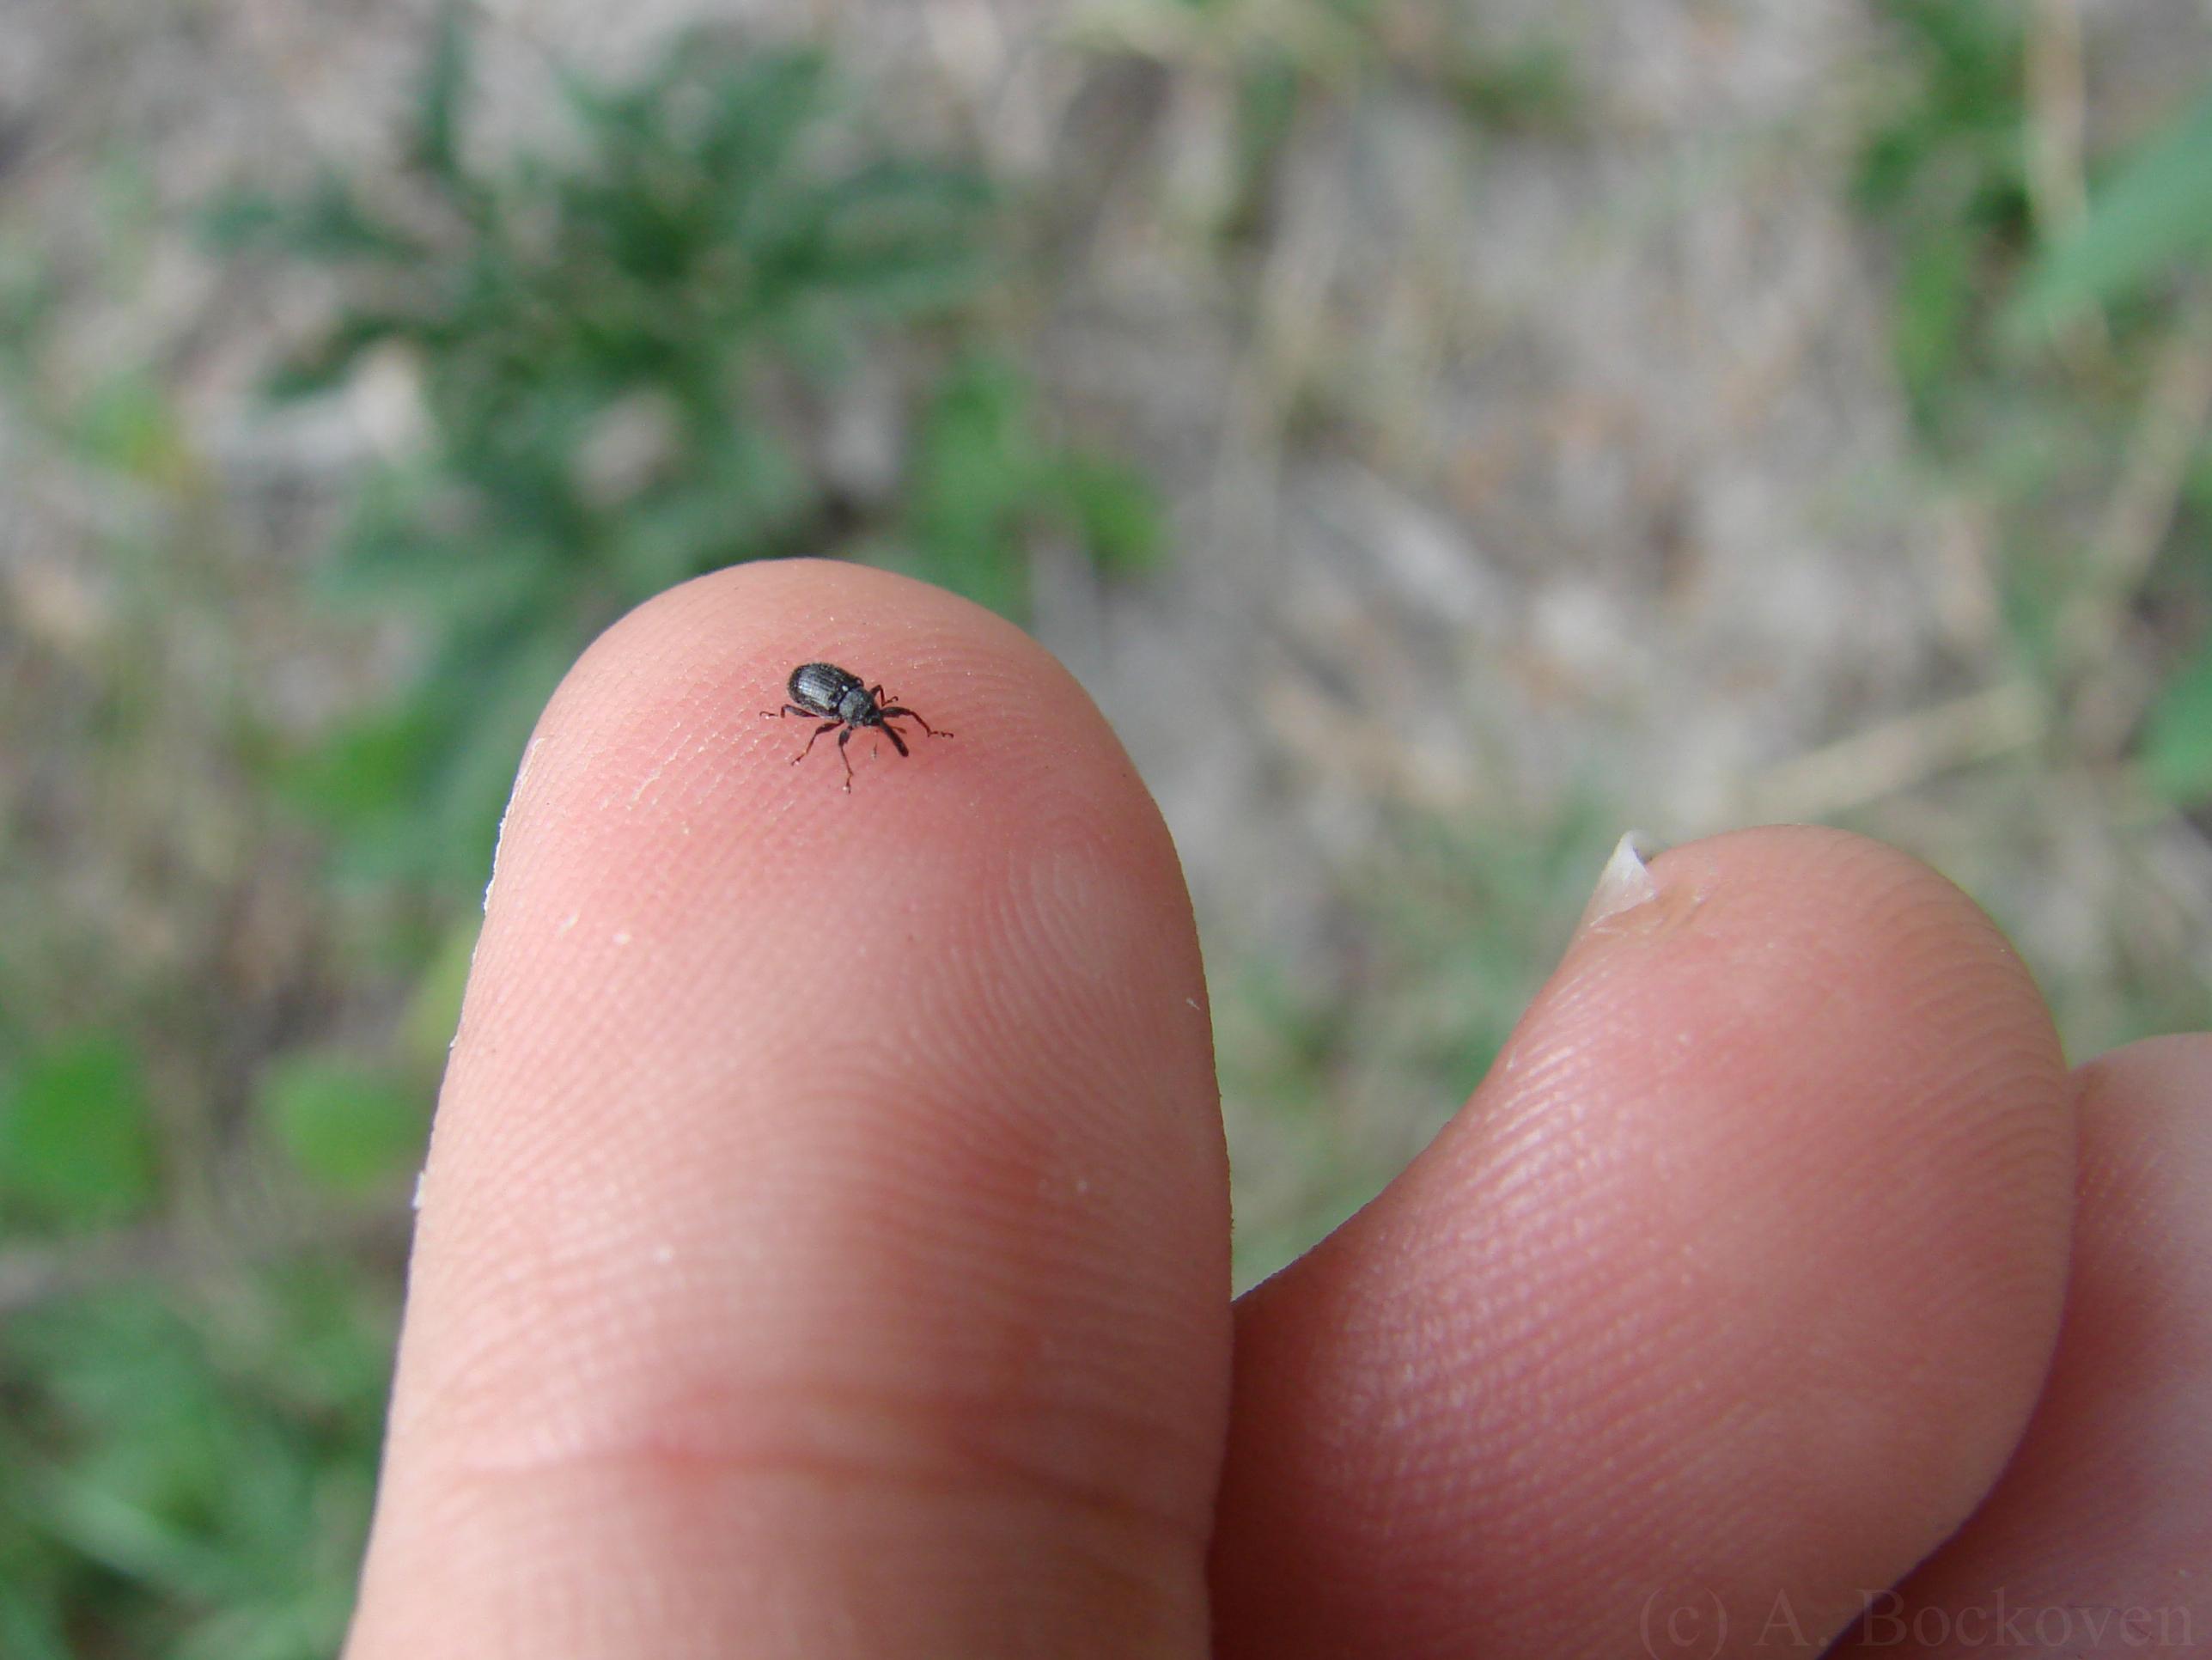 Gracious Long Bugs On Flowers Small Black Beetle Identification Small Black Beetle Utah Tiny Black Beetle houzz-03 Small Black Beetle